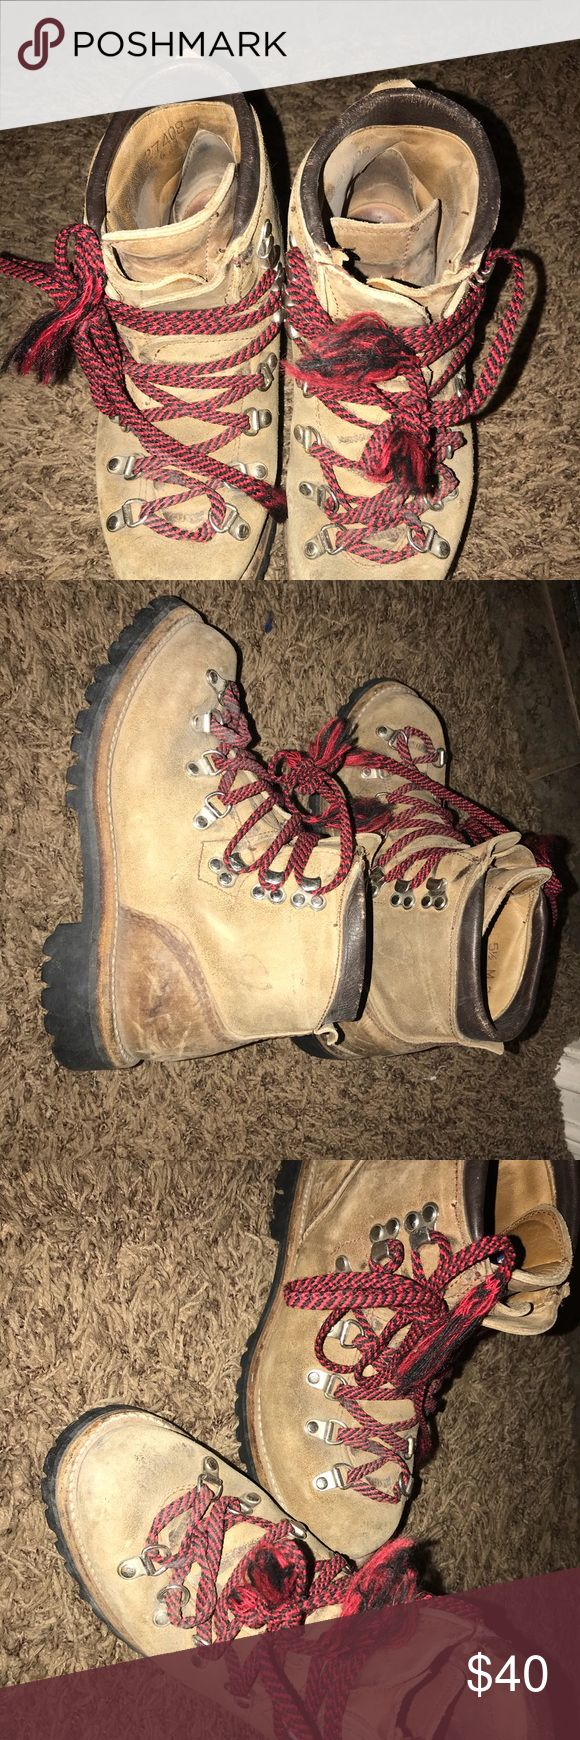 🔥🔥 Vasque - Vintage Vasque Hiking Boots Vasque - Vintage Vasque Hiking Boots - Have a Men's 5.5 and 6.5  which will fit Women's 7.5 and 8.5 Vasque Shoes Lace Up Boots